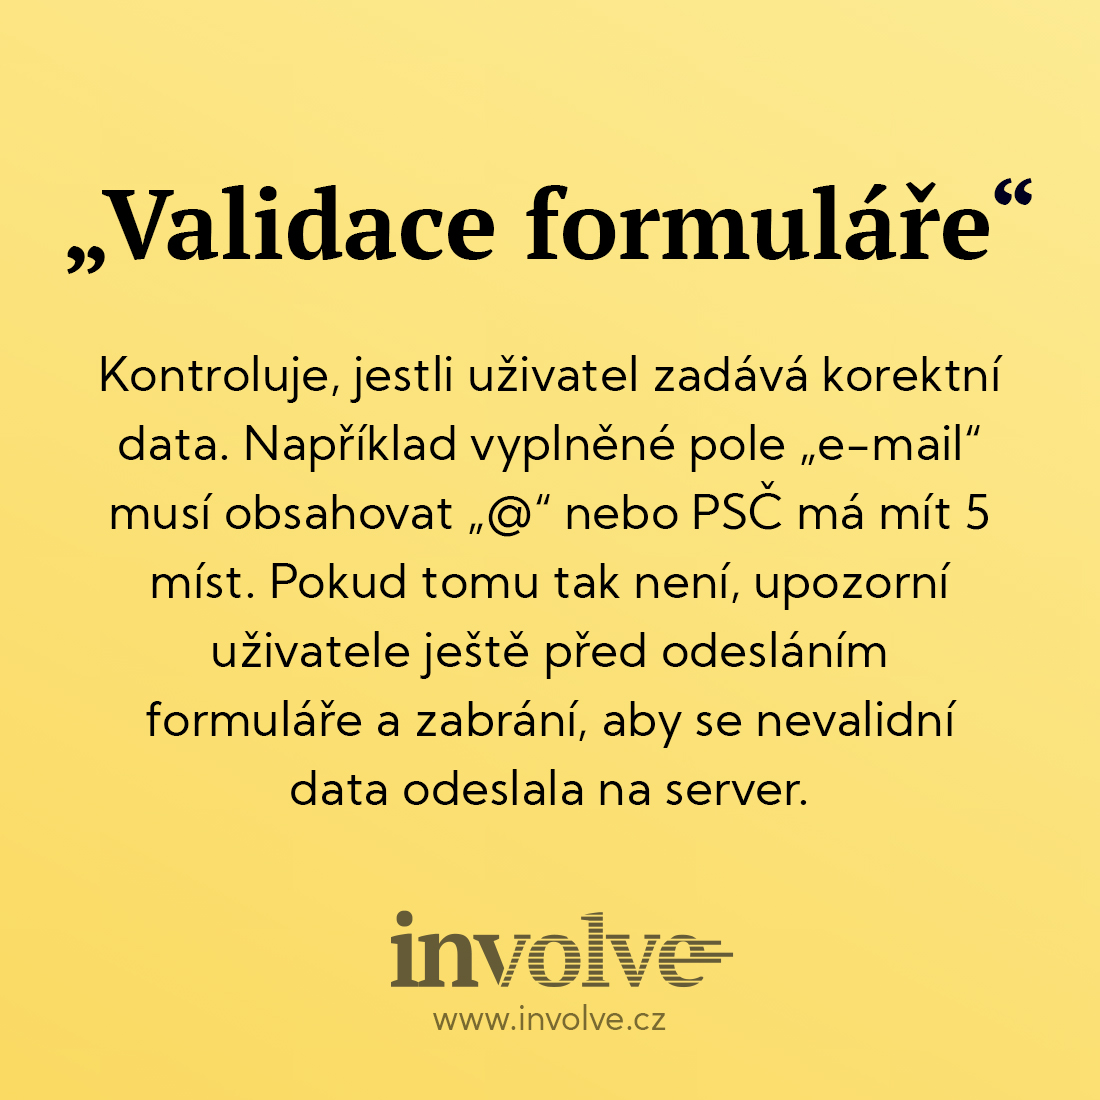 Validace